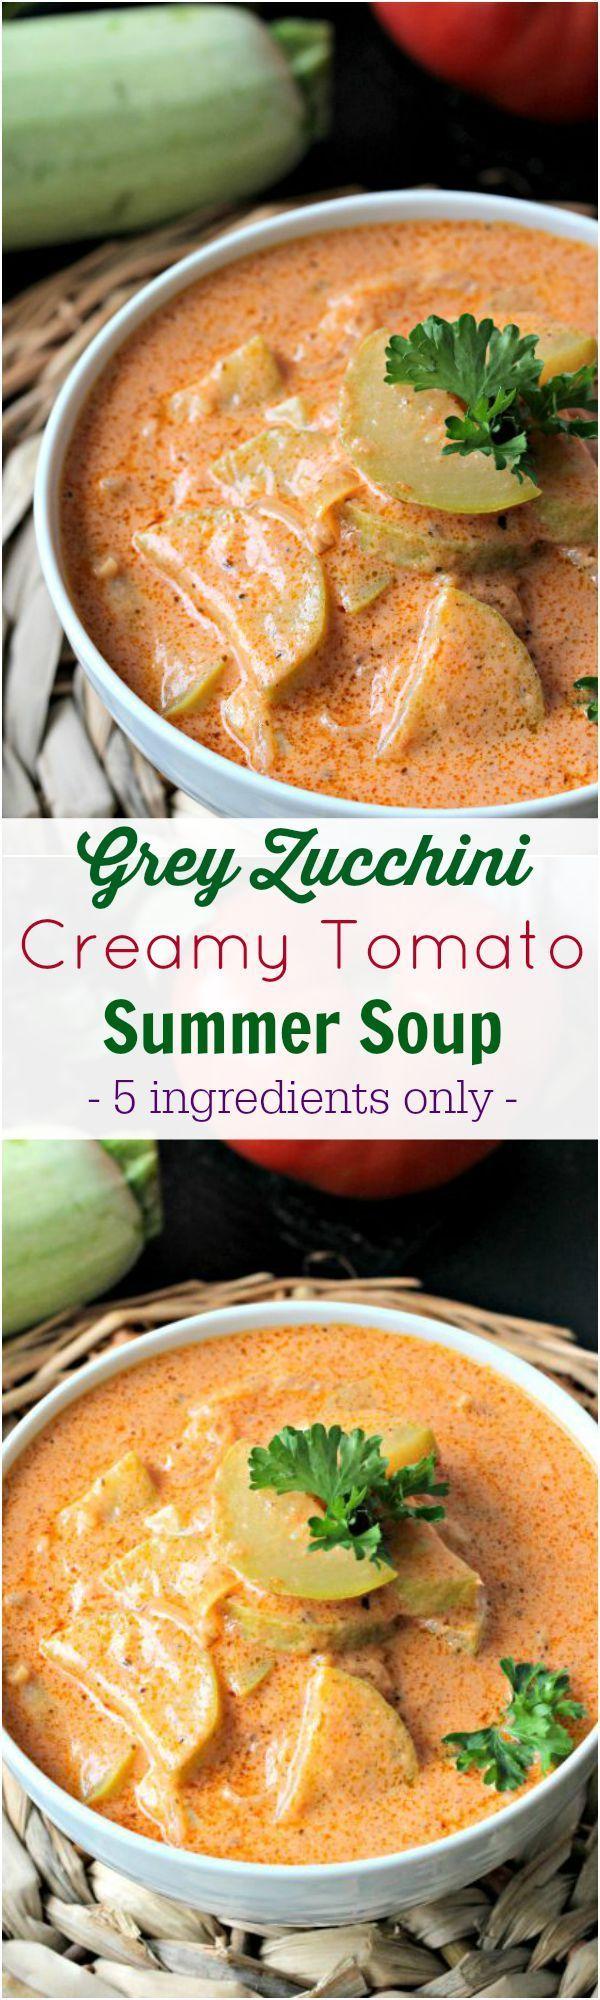 Summer Fresh Creamy Grey Zucchini Tomato Soup - Peas and Peonies #soup #tomatosoup